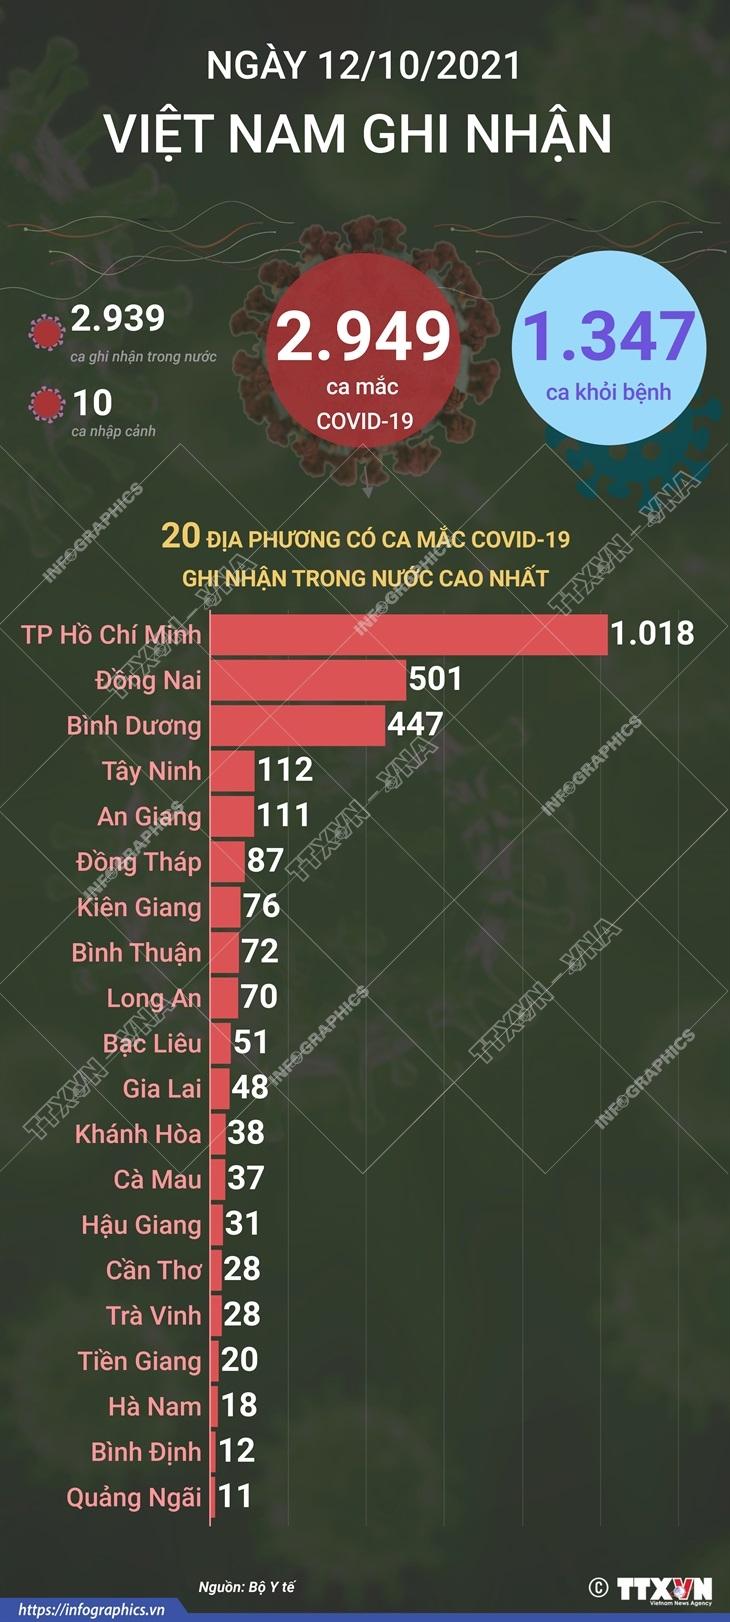 [Infographics] Ngay 12/10: Ghi nhan 2.949 ca mac, 1.347 ca khoi benh hinh anh 1